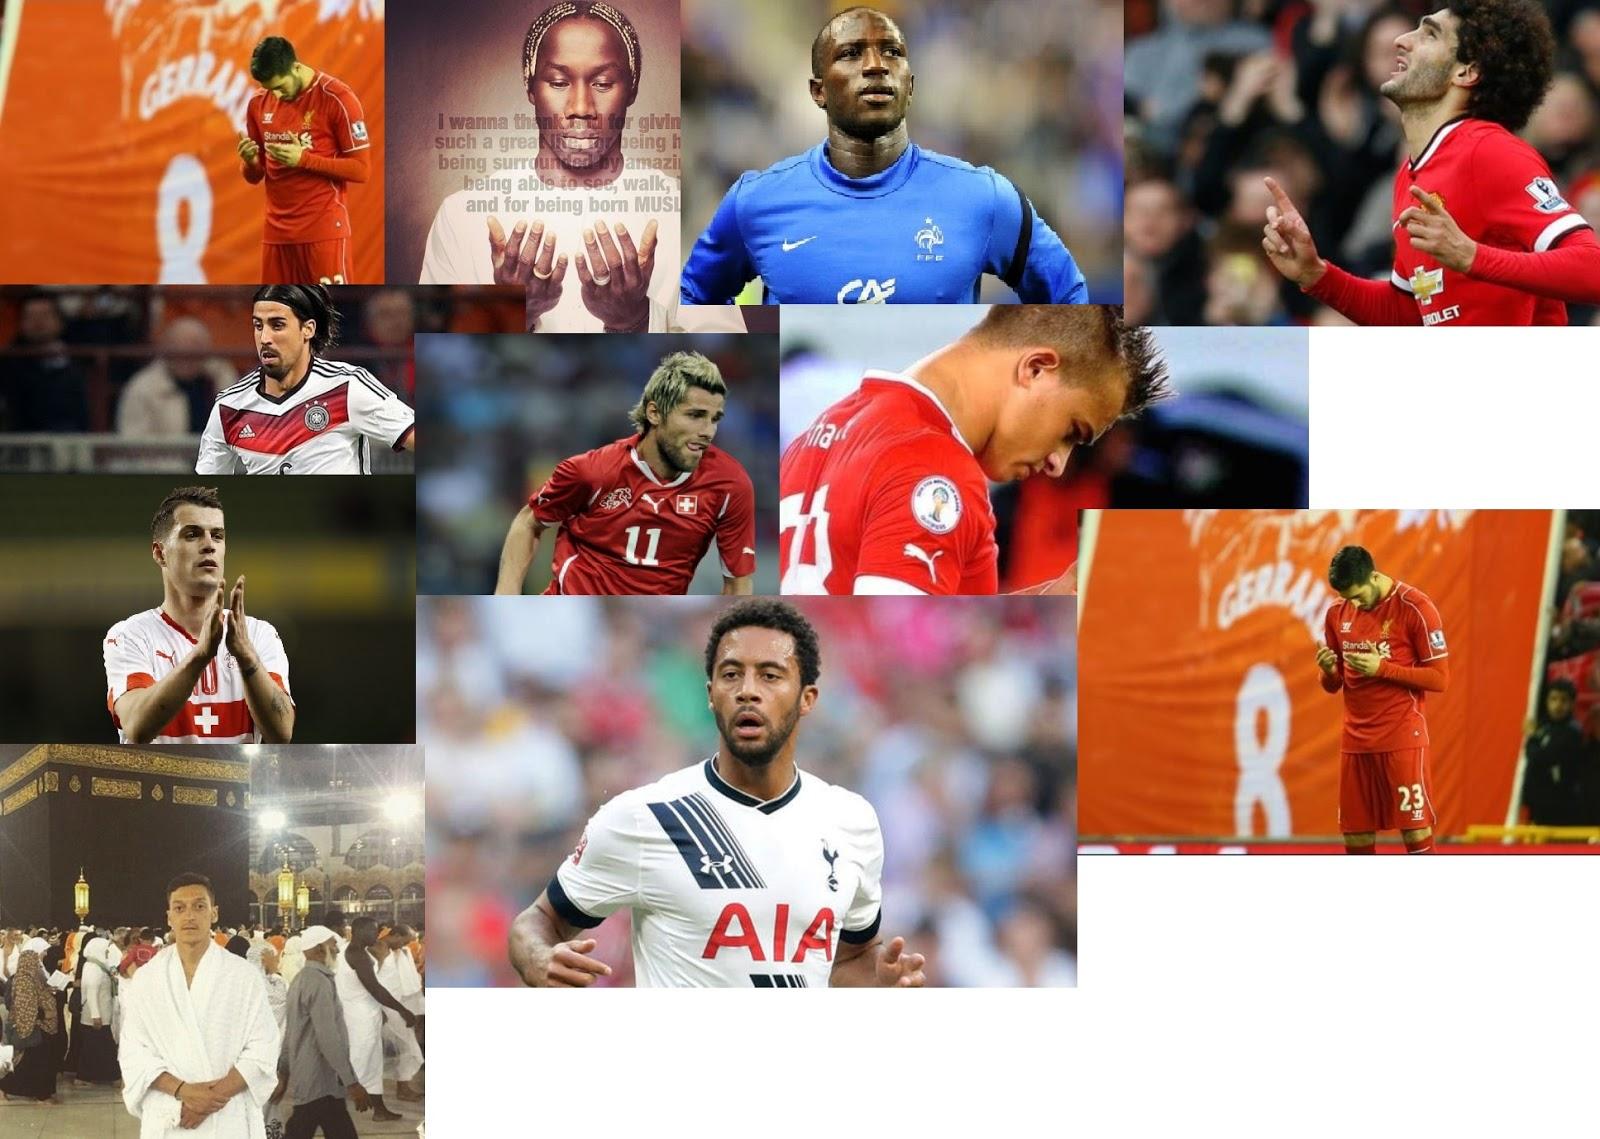 Inilah Dia 10 Pemain Sepakbola Muslim Yang Akan Berlaga Di